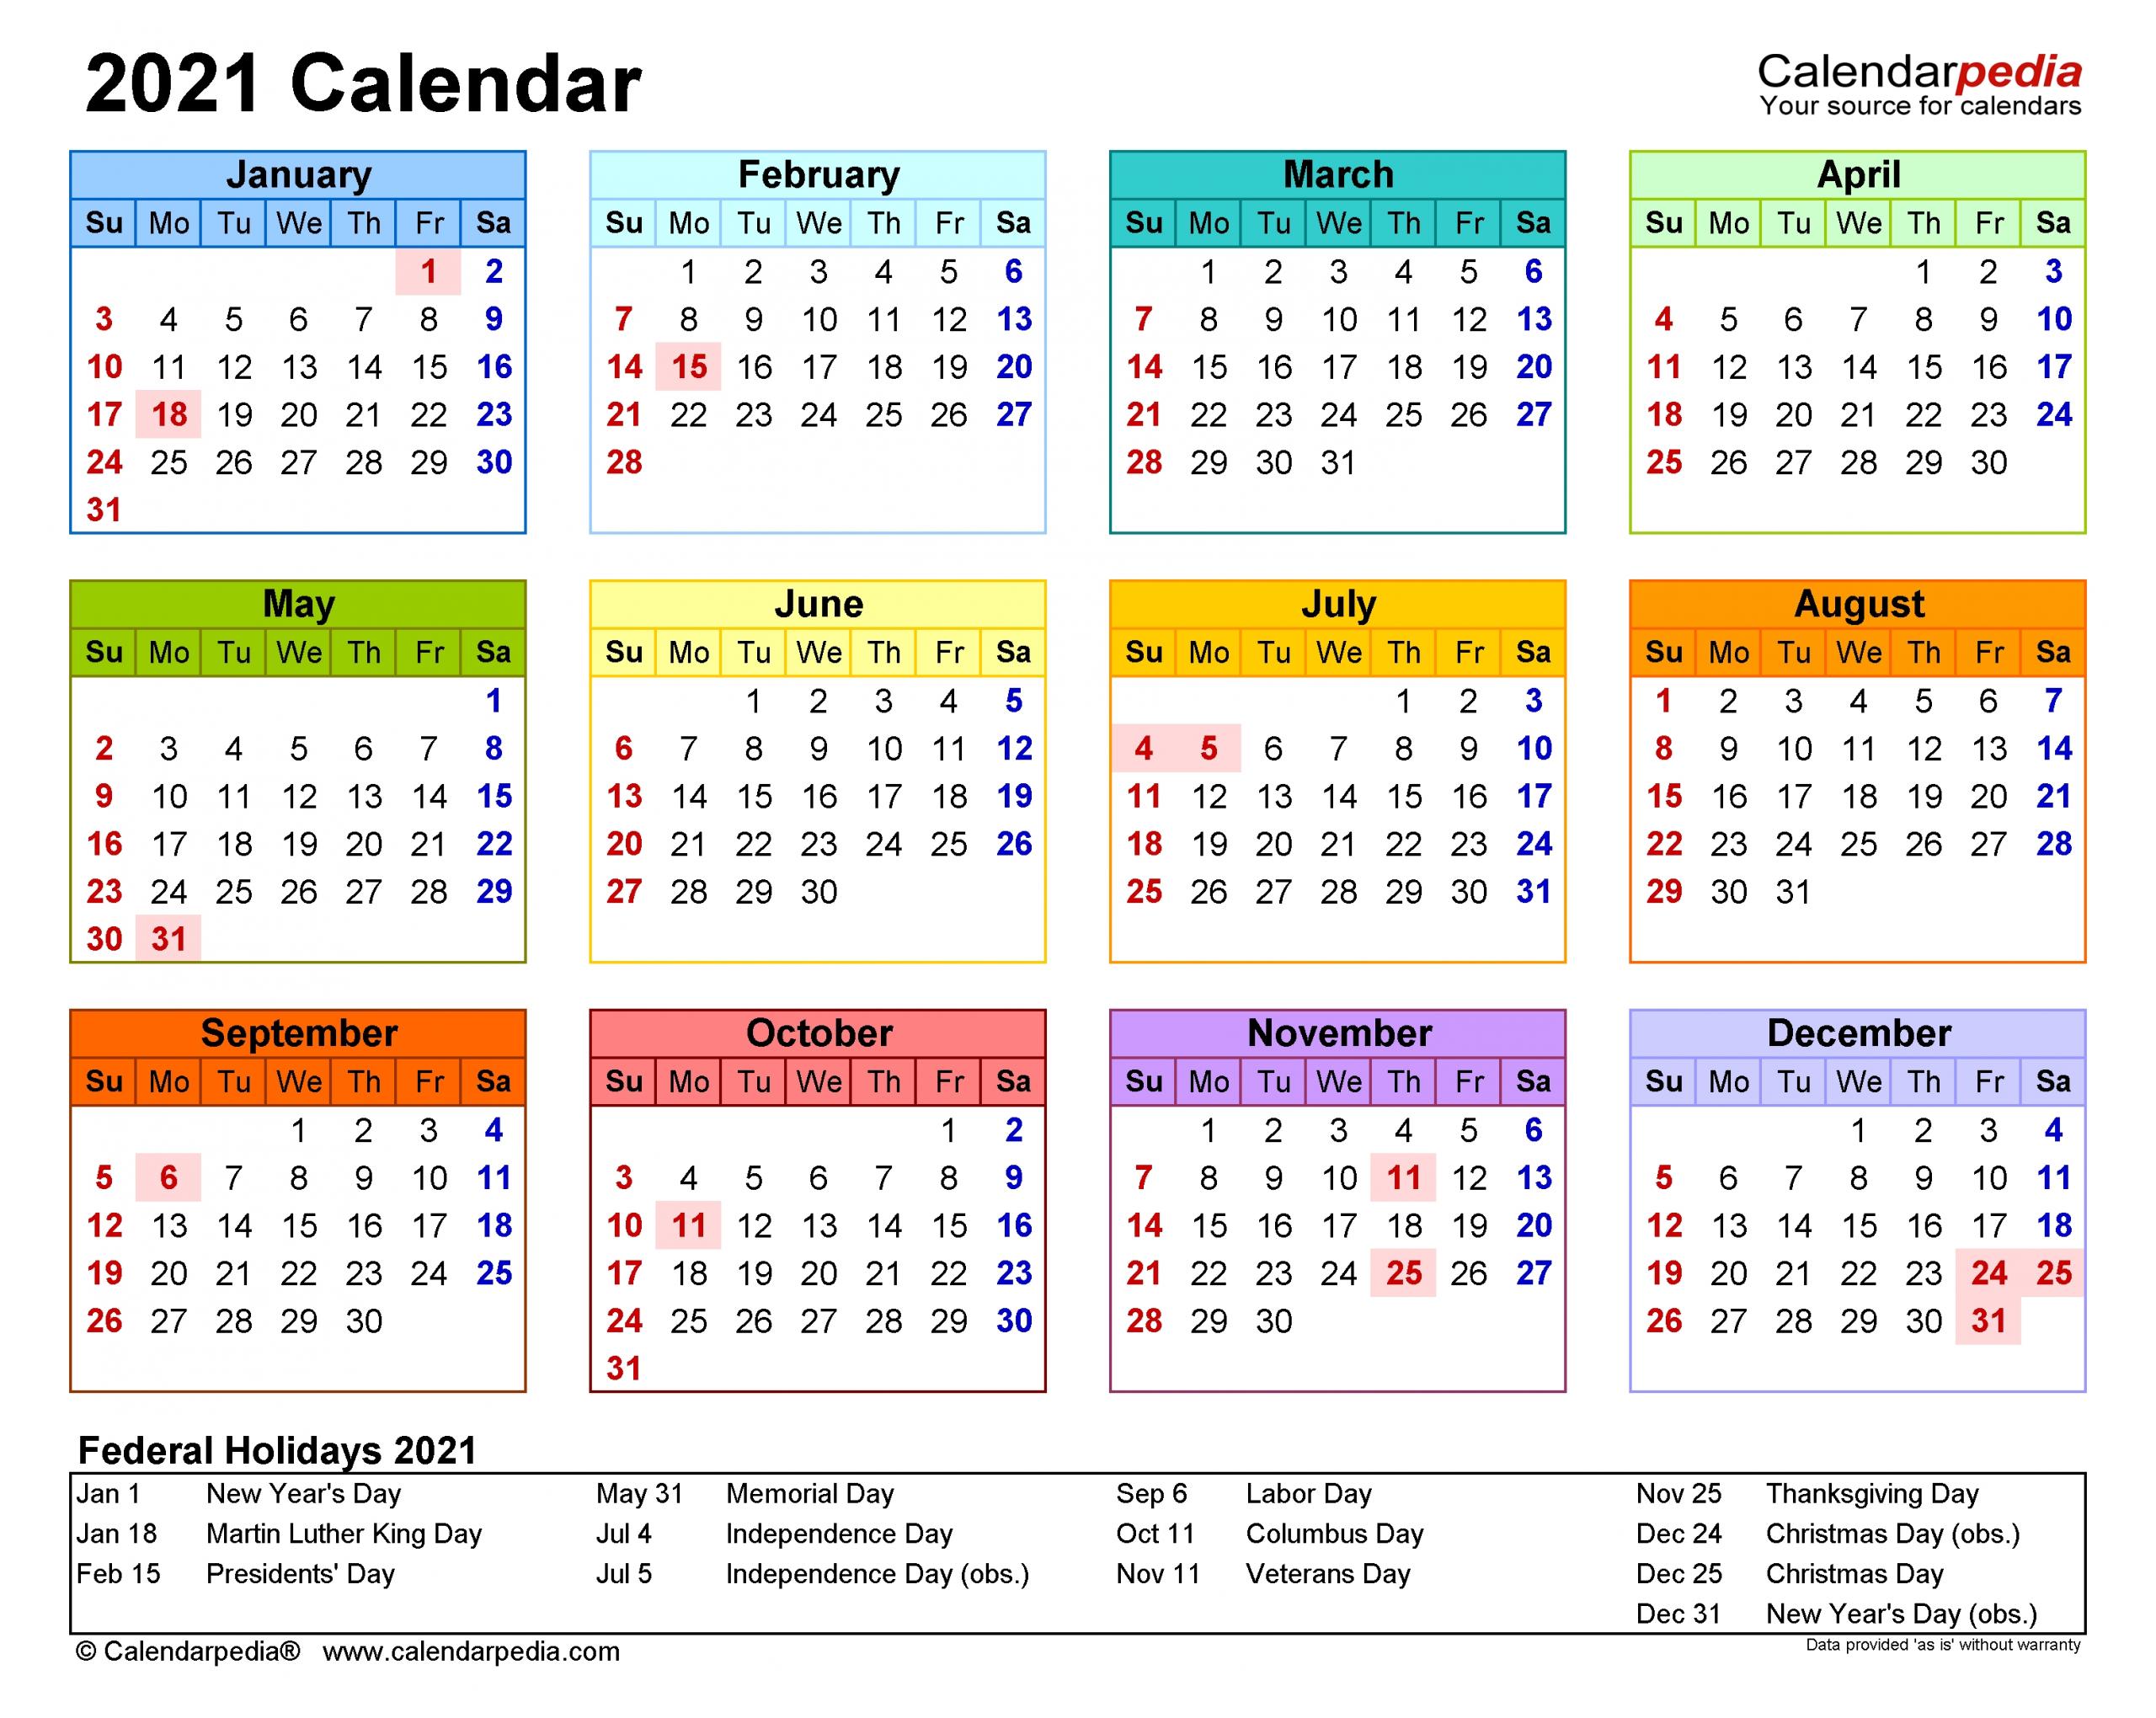 2021 Calendar - Free Printable Excel Templates - Calendarpedia-Download 2021 Philippine Blank Calendar In Excel